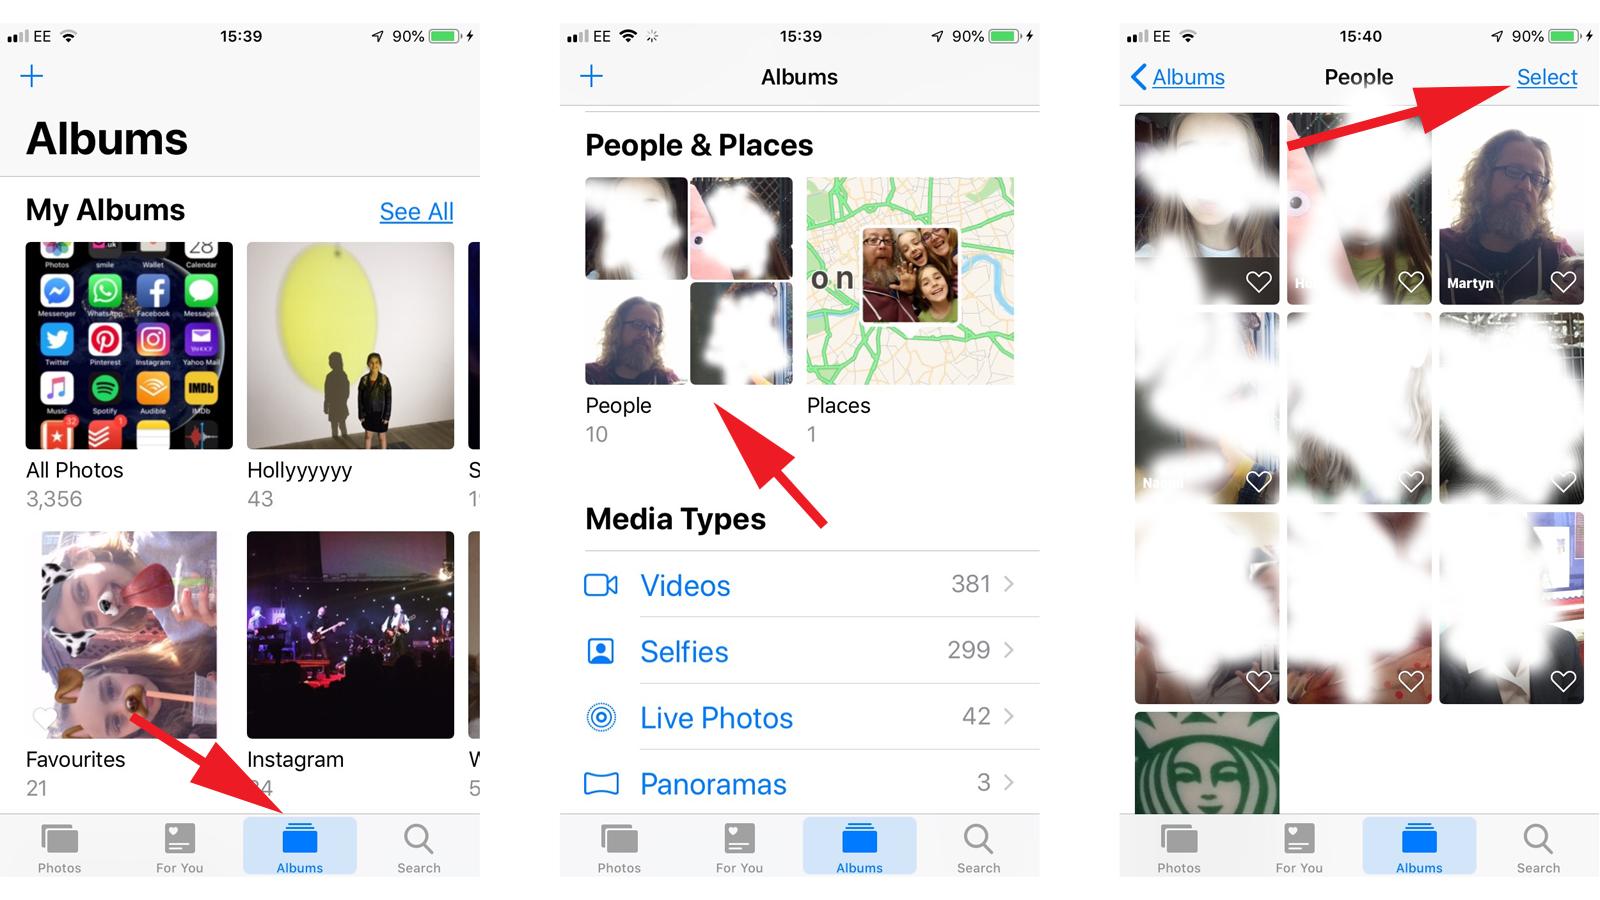 Cómo corregir caras identificadas incorrectamente en fotos de iPhone: álbumes